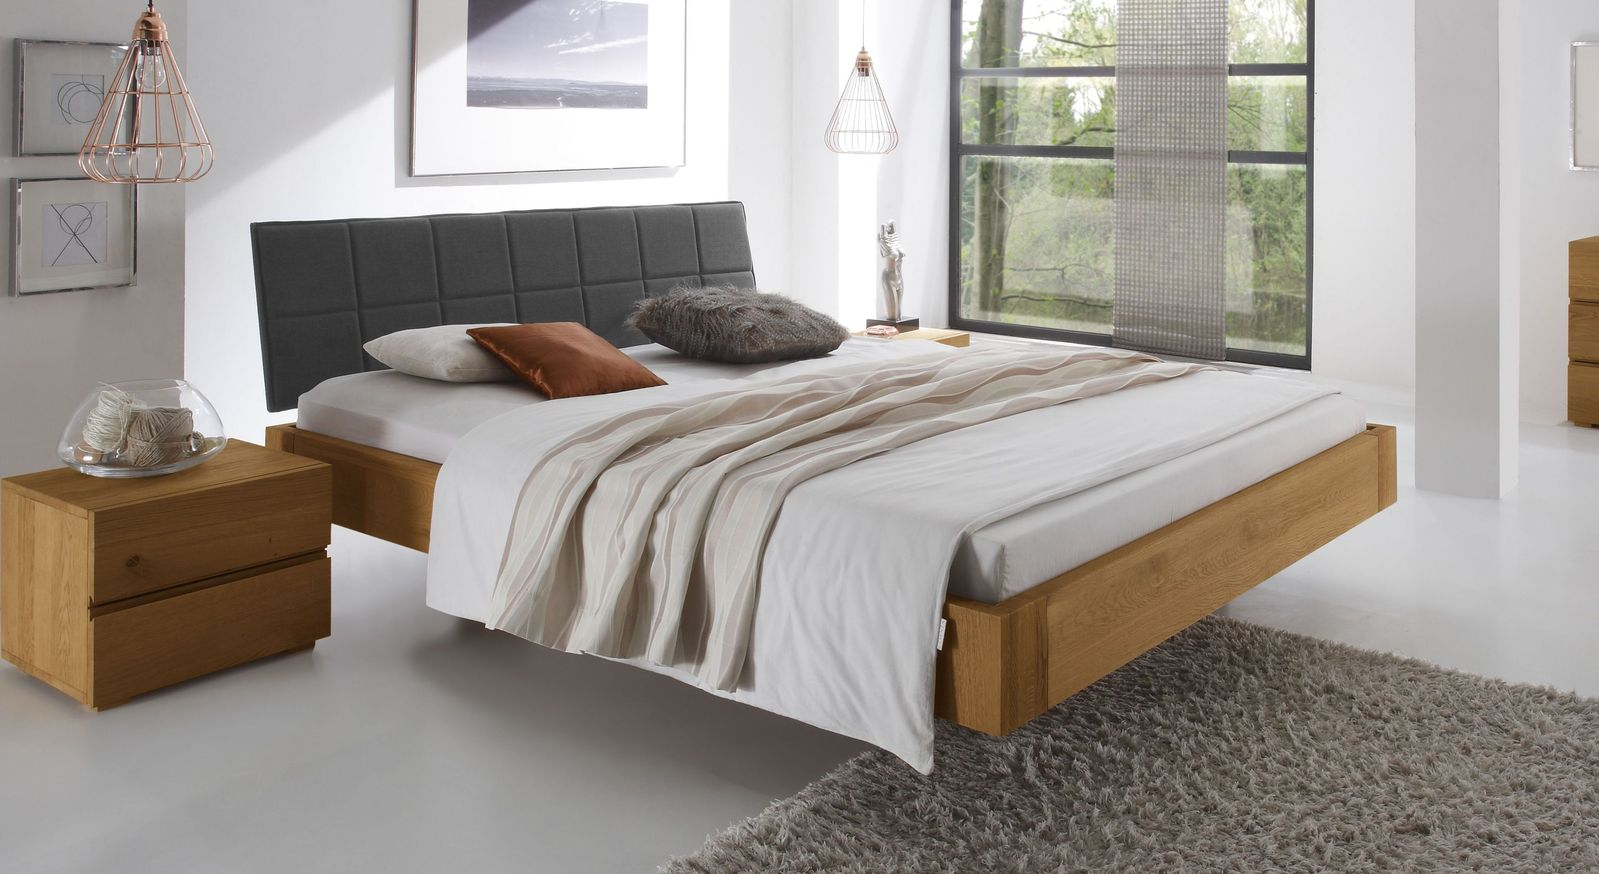 Naturfarbenes Bett Belbari mit Kopfteil in Anthrazit